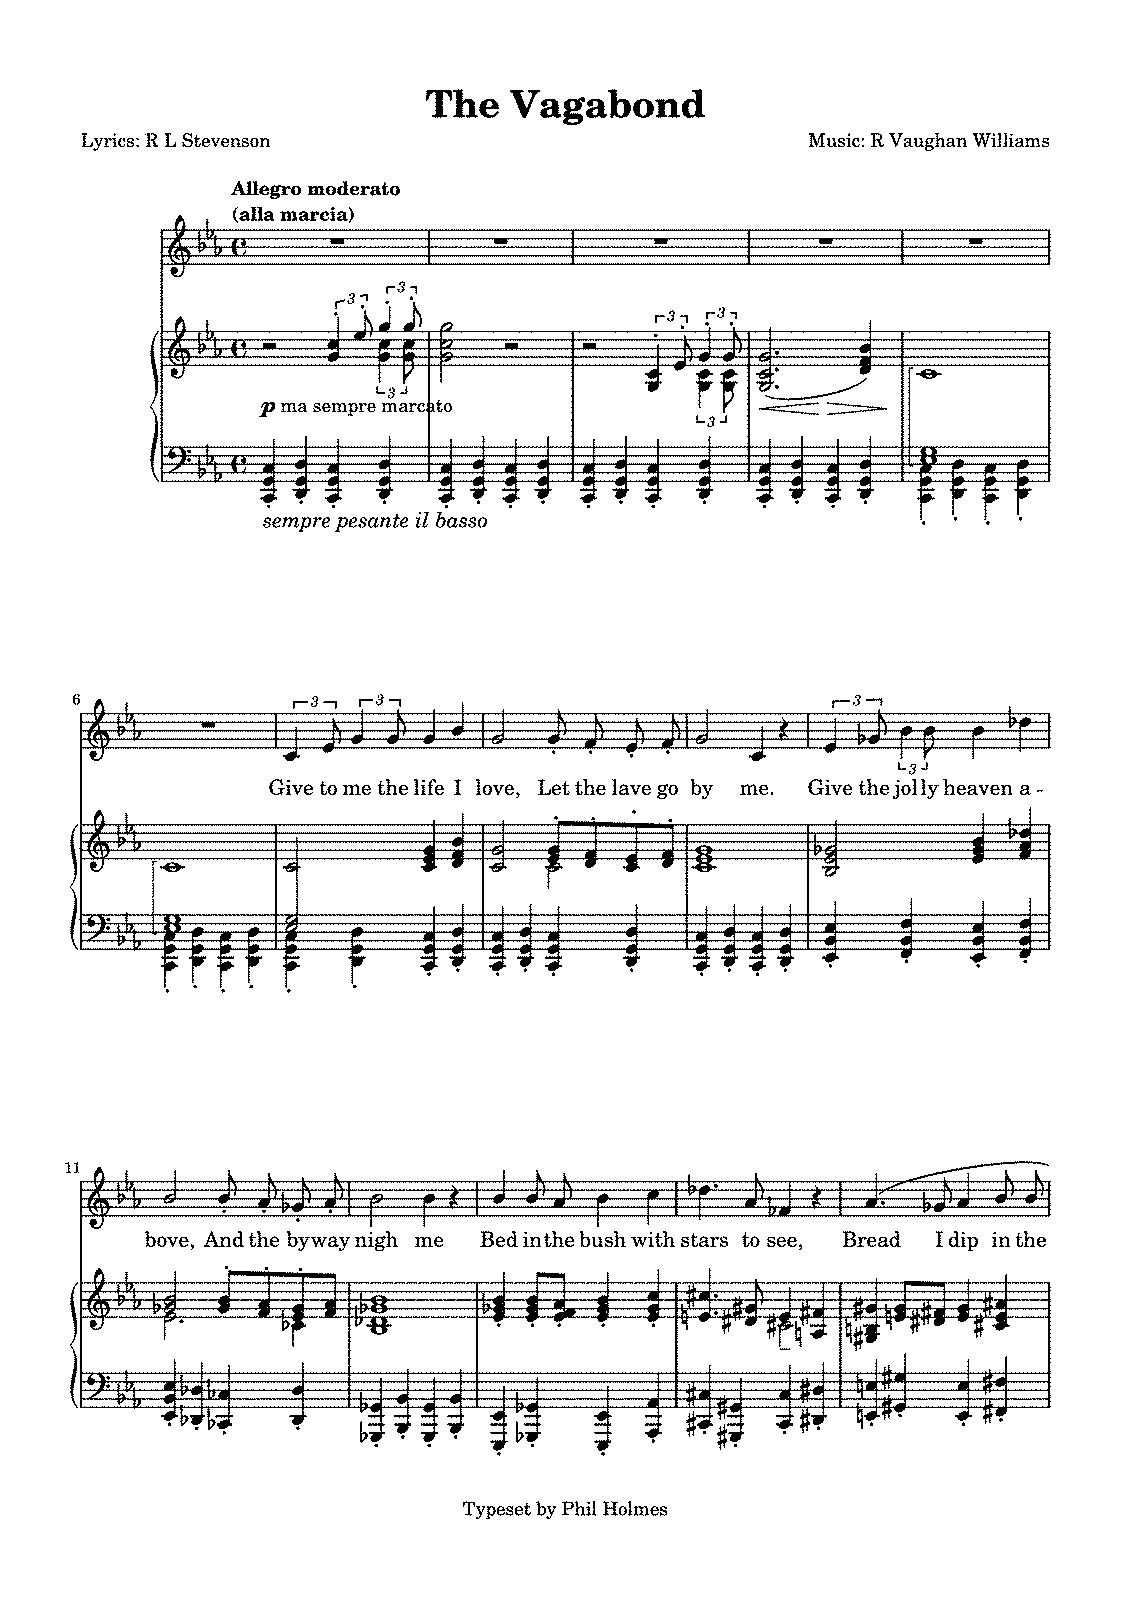 Songs of Travel (Vaughan Williams, Ralph) - IMSLP: Free